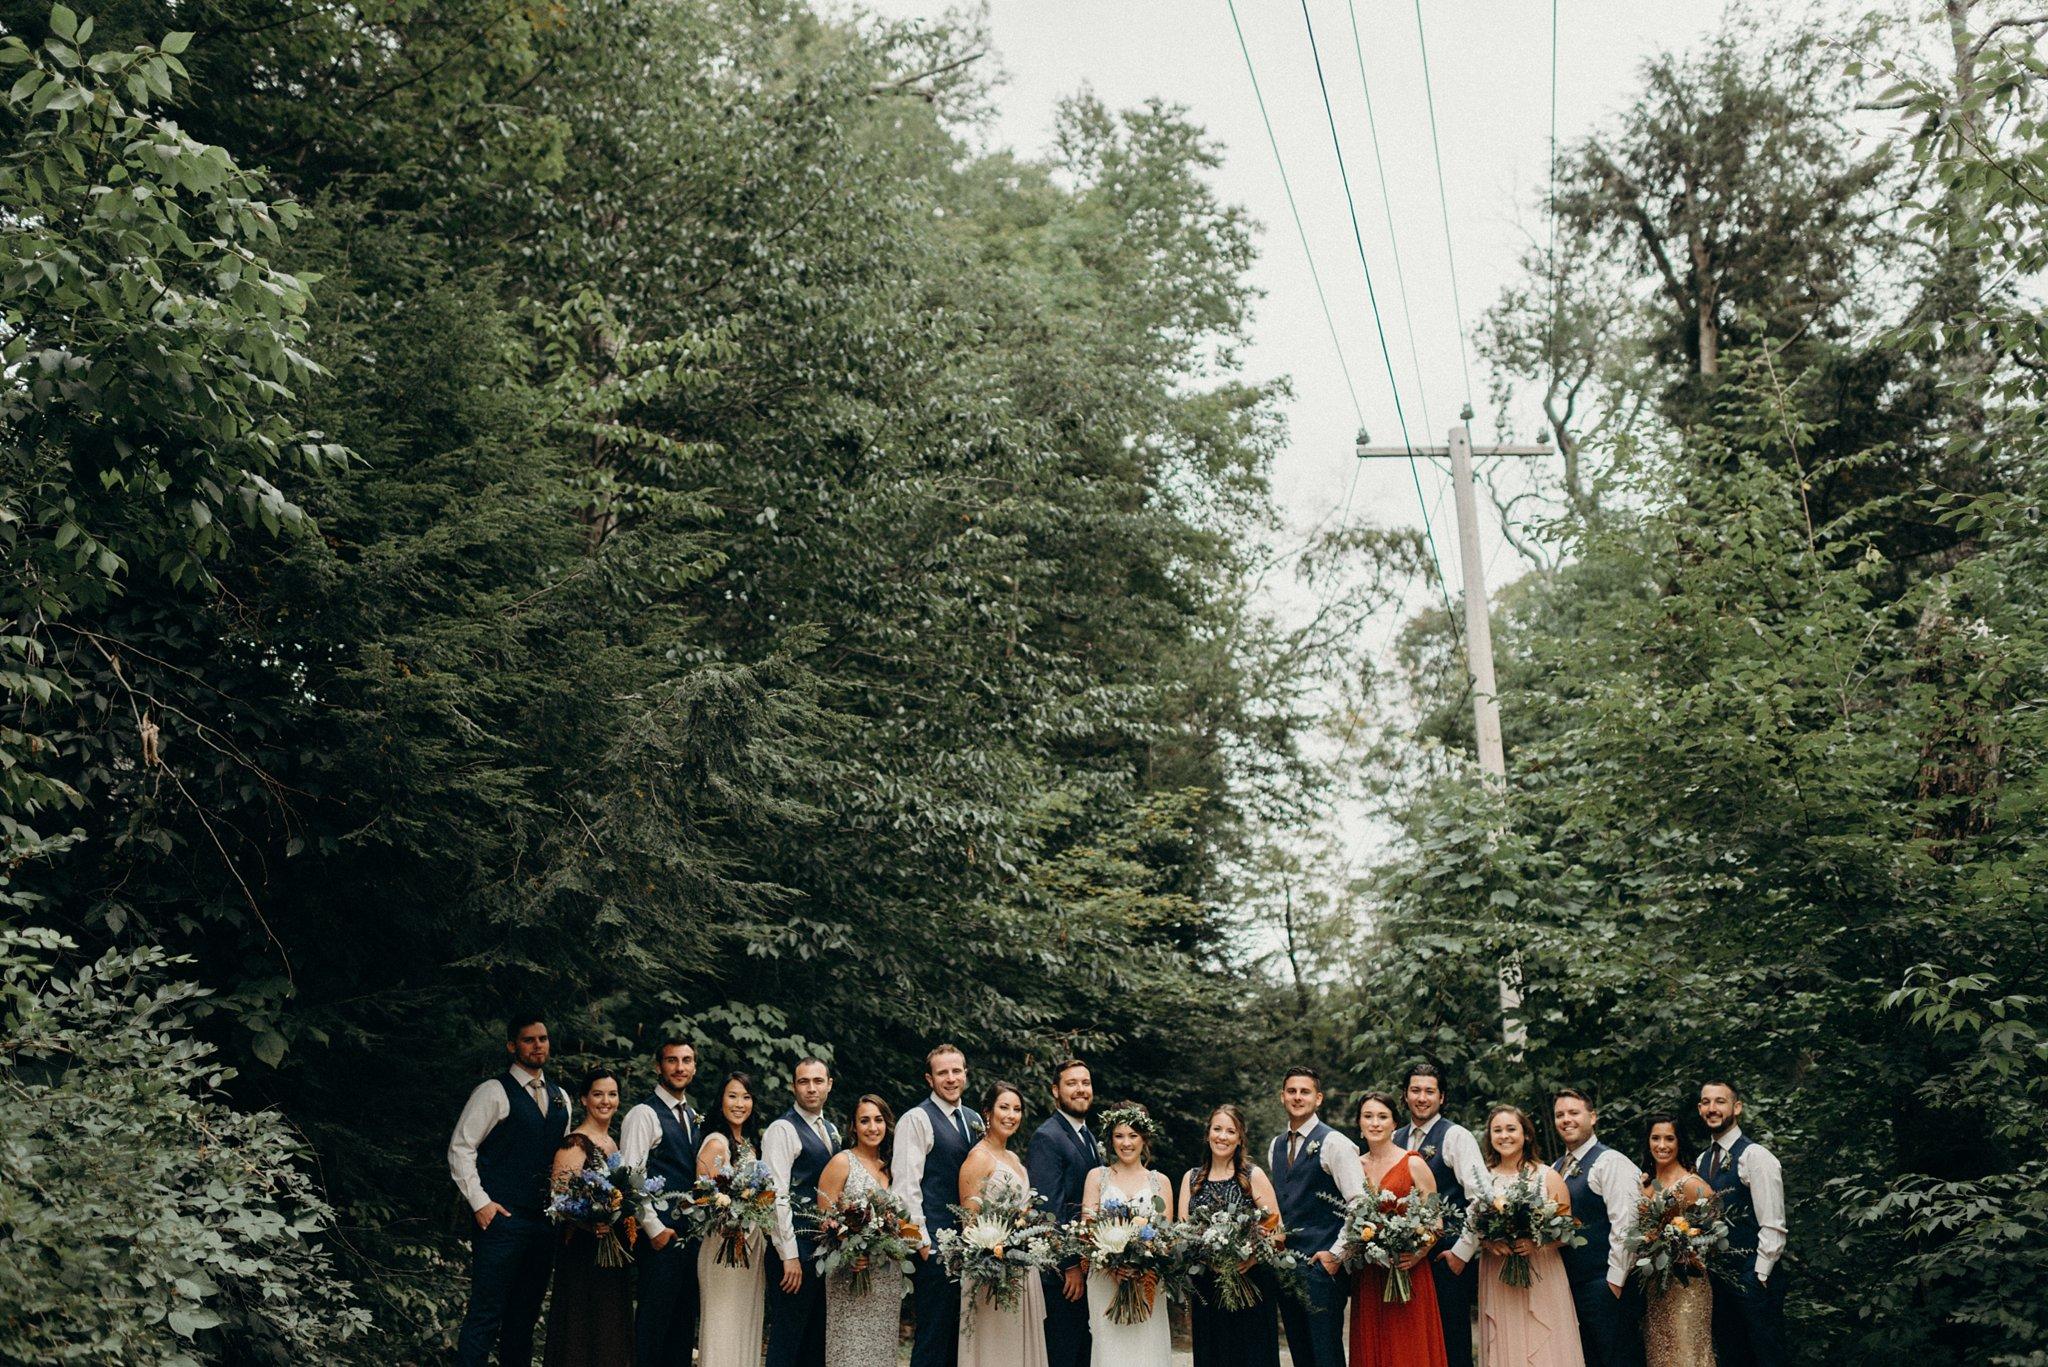 kaihla_tonai_intimate_wedding_elopement_photographer_6607.jpg